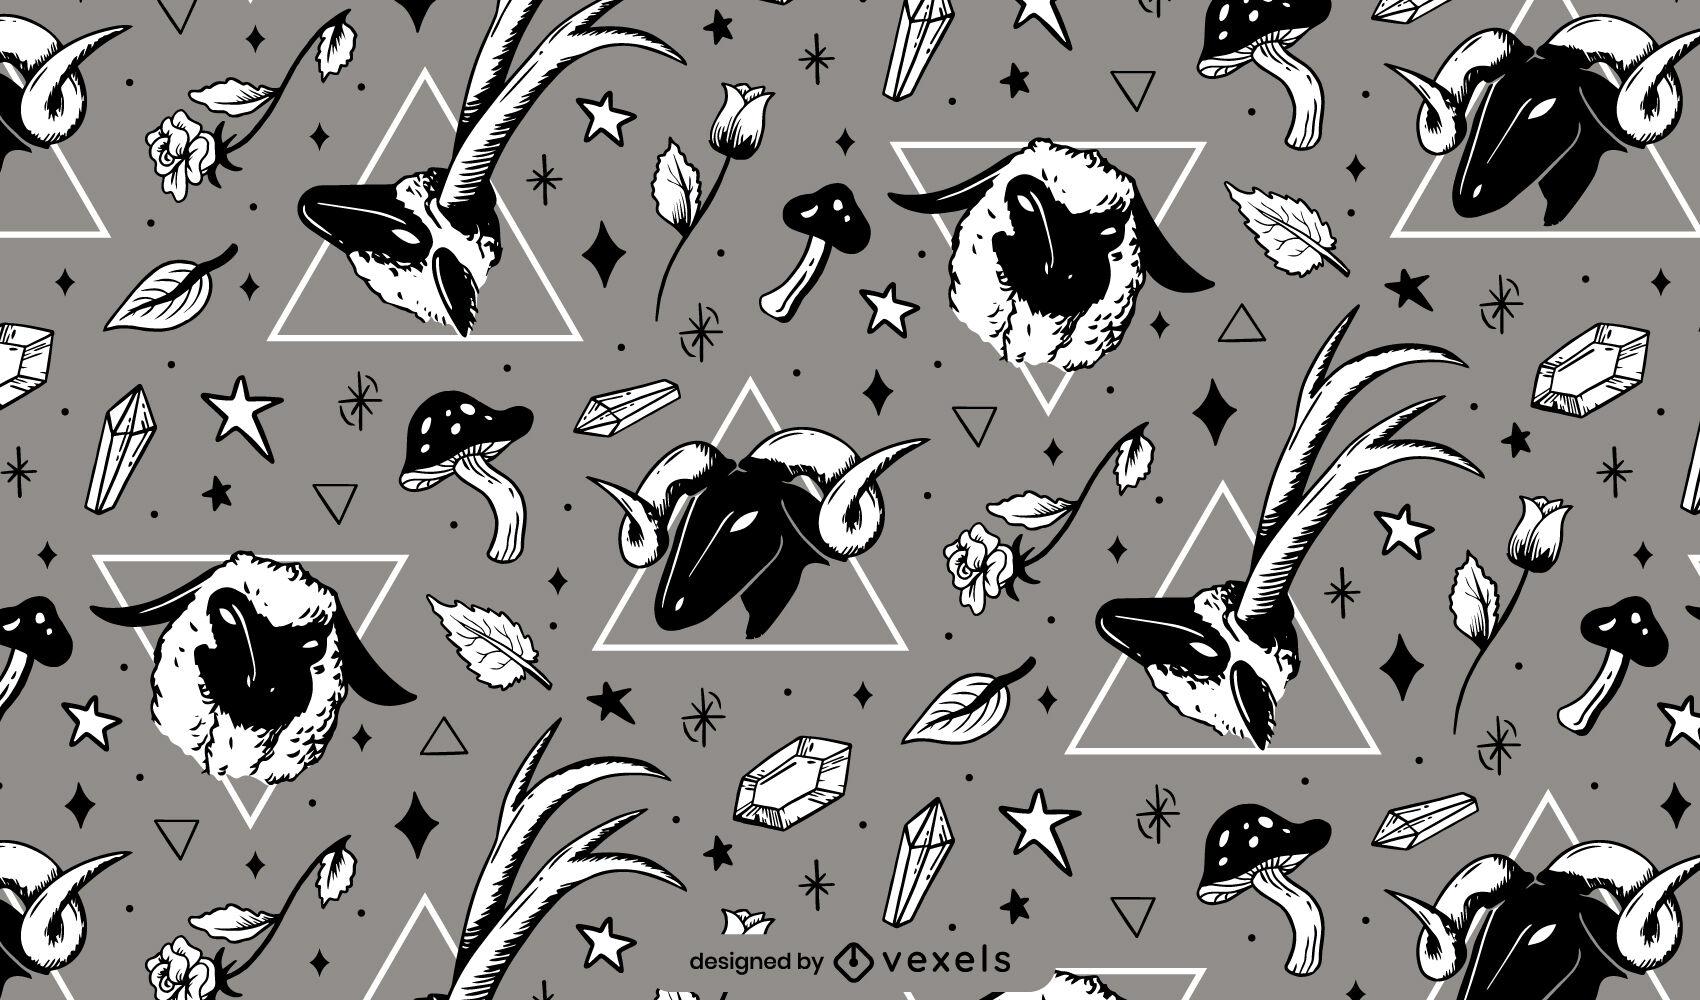 Schaf Tier magisches Musterdesign